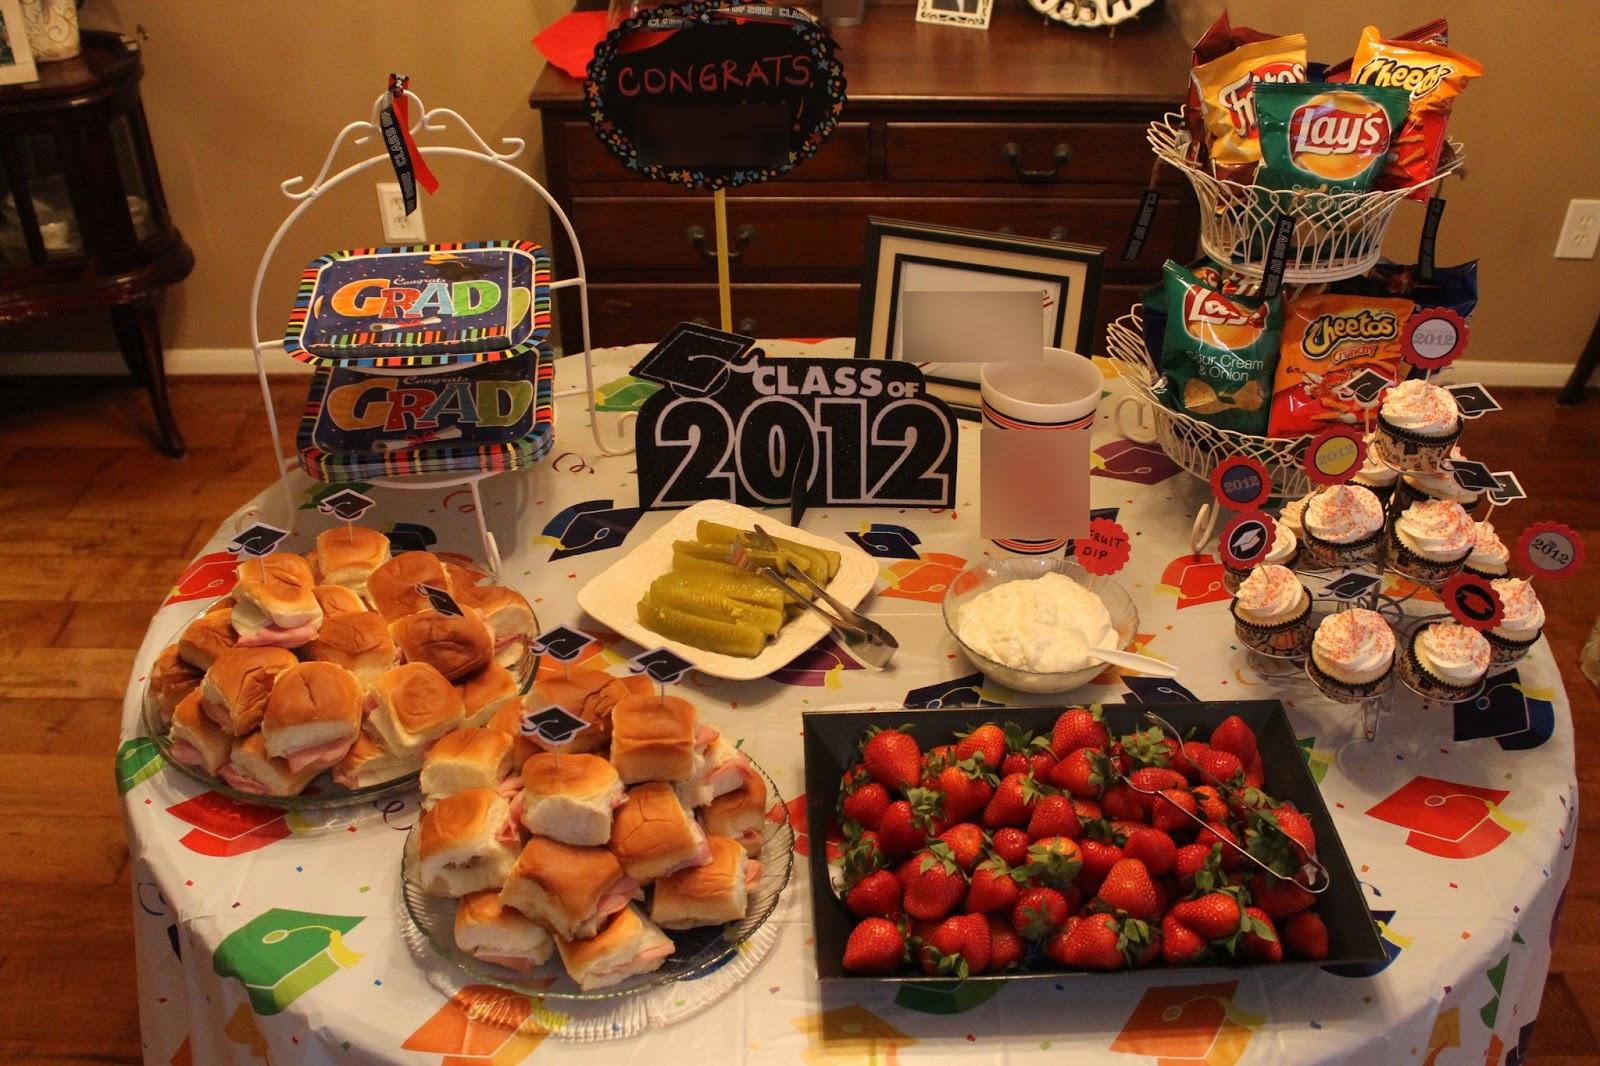 Graduation Dinner Party Ideas  Texas Decor Graduation Party Gift Ideas